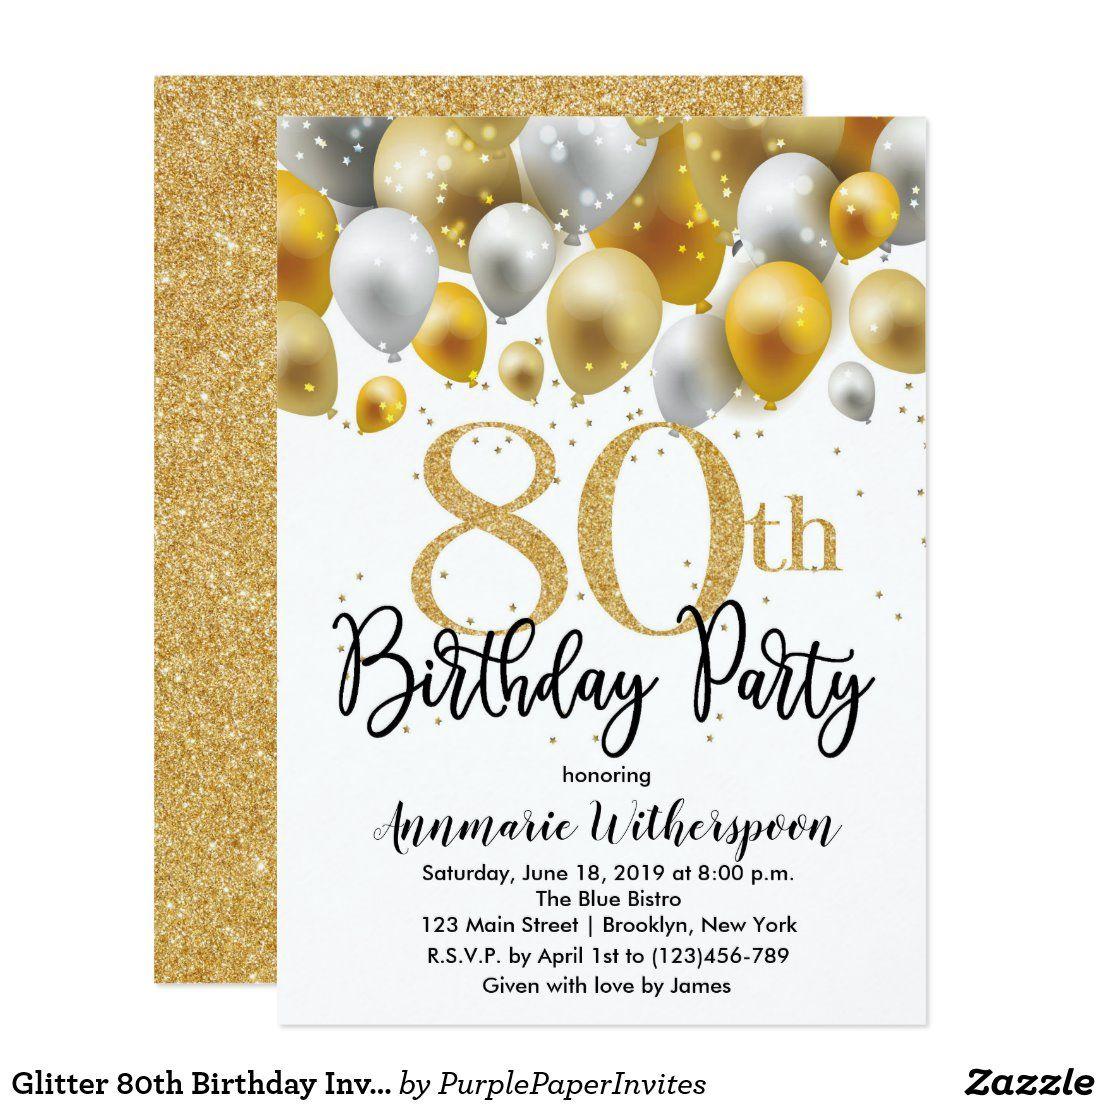 Glitter 80th Birthday Invitation Gold Balloons | Zazzle.com in 2020 | 80th  birthday invitations, Birthday invitations, Adult birthday invitations